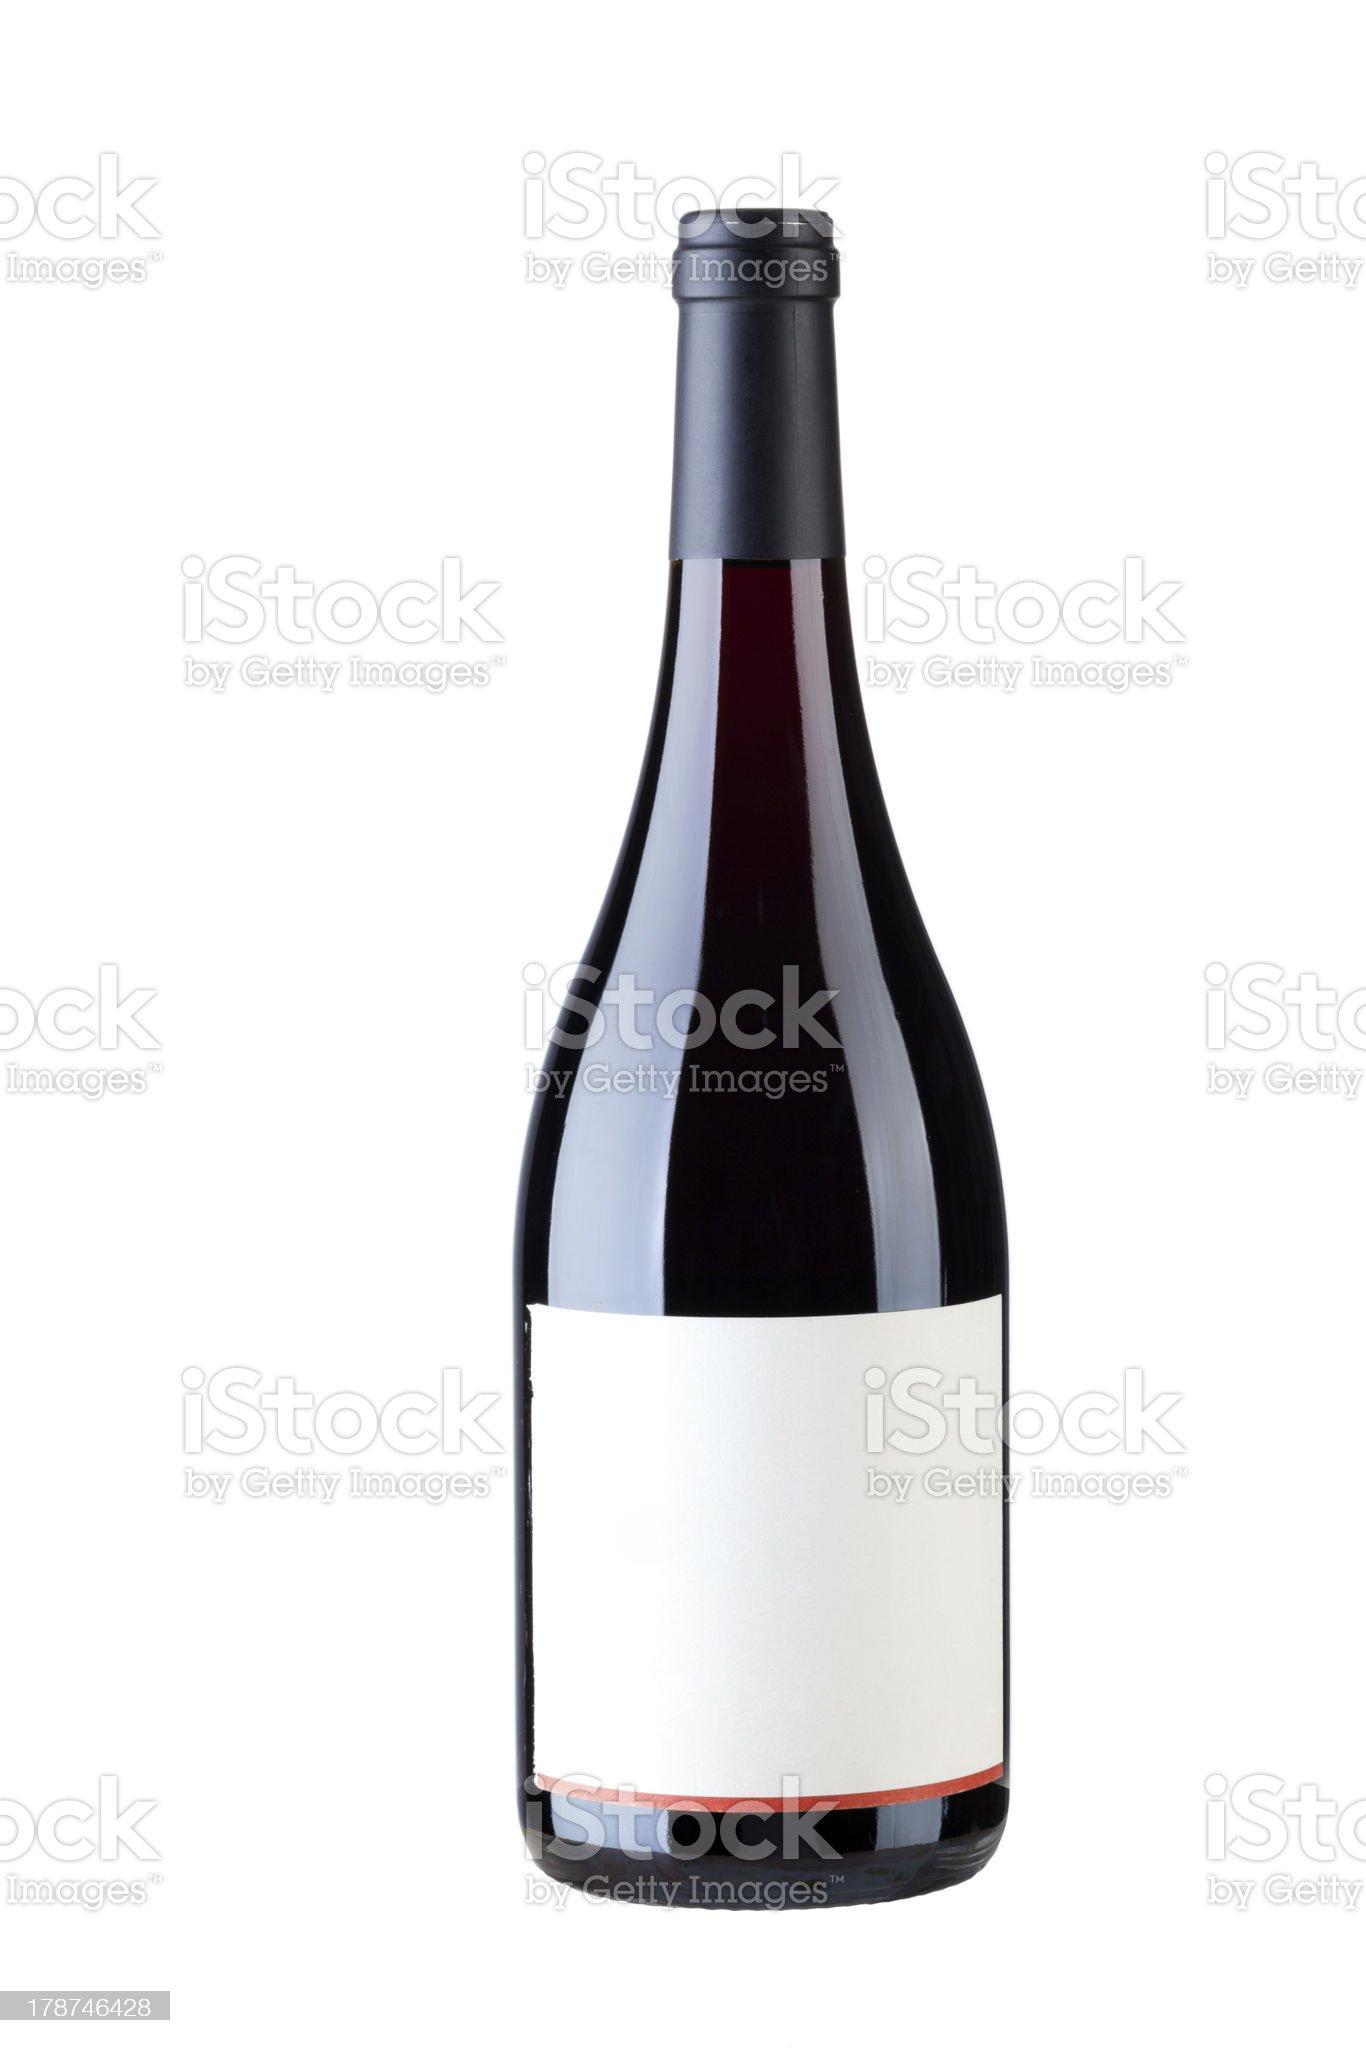 Single wine royalty-free stock photo